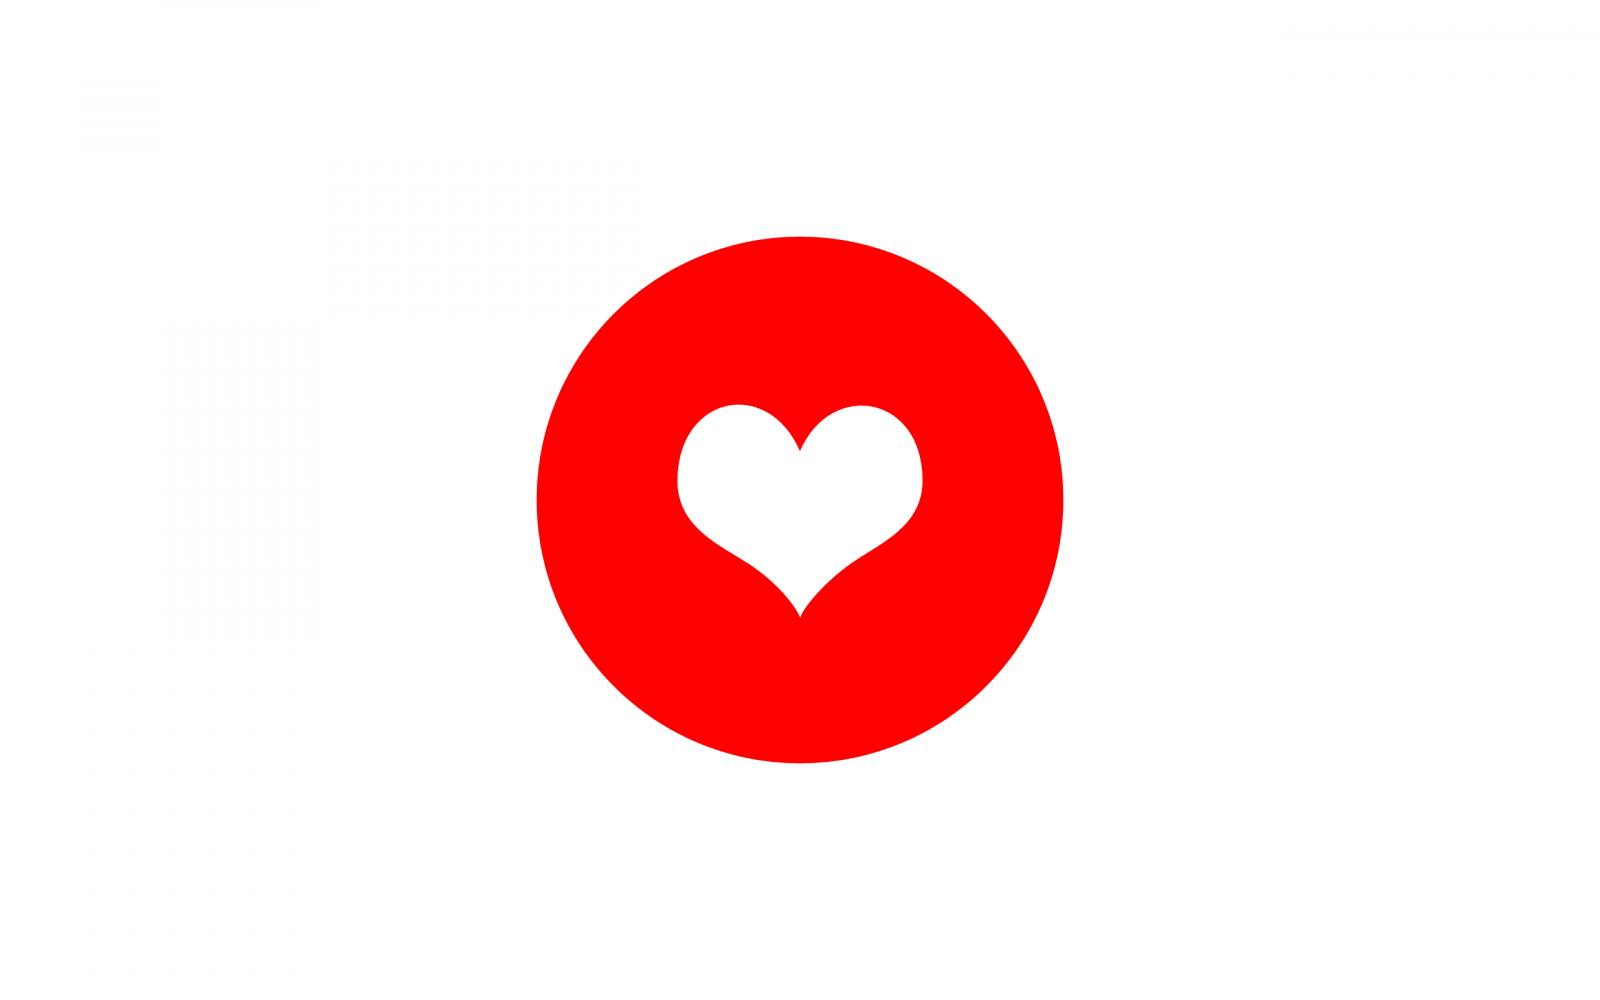 Hintergrundbilder : Japan, bunt, Herz, Text, Logo, Flagge, Kreis ...